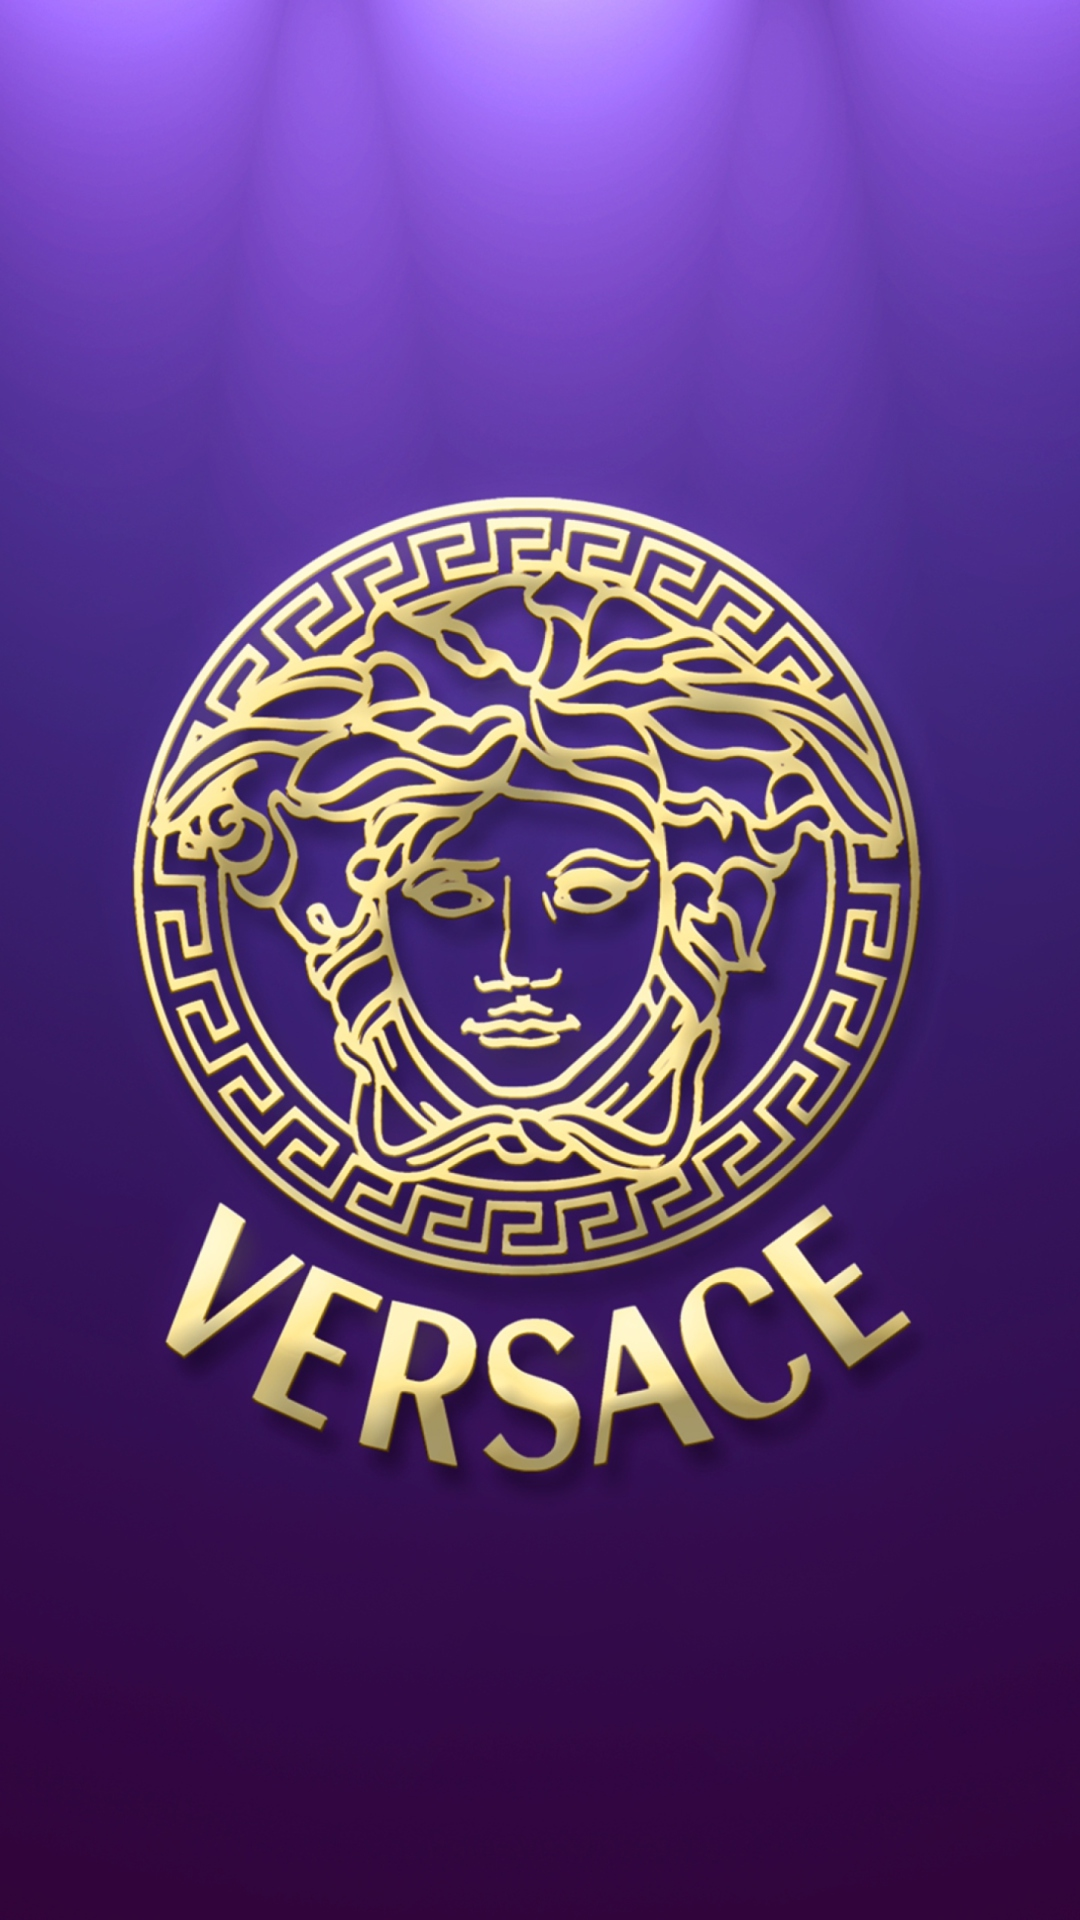 Versace wallpaper for iphone 6 plus - Versace logo wallpaper hd ...